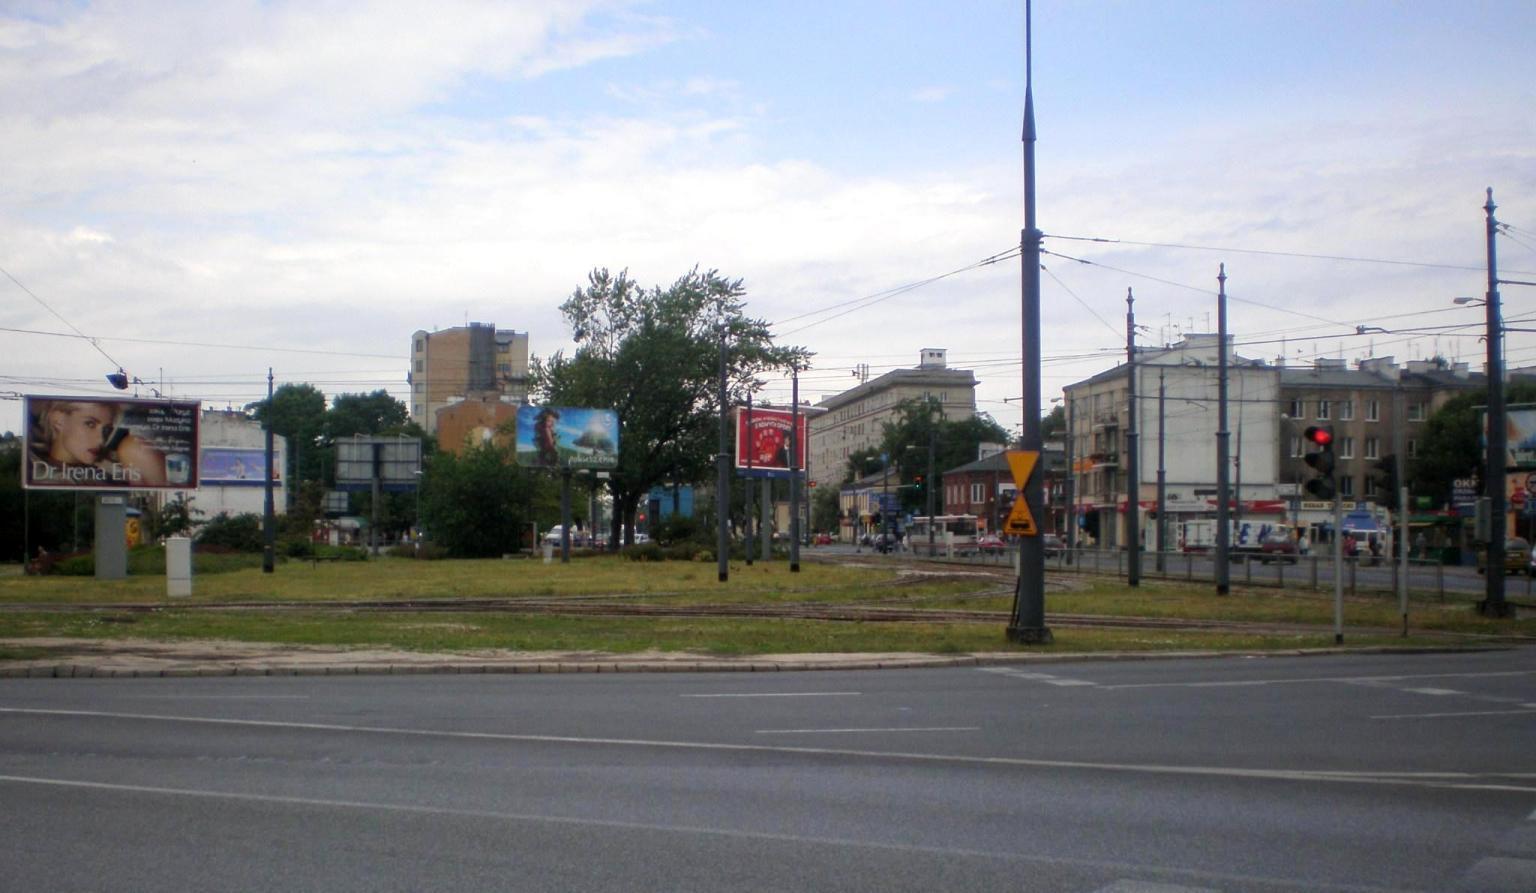 Rondo Wiatraczna